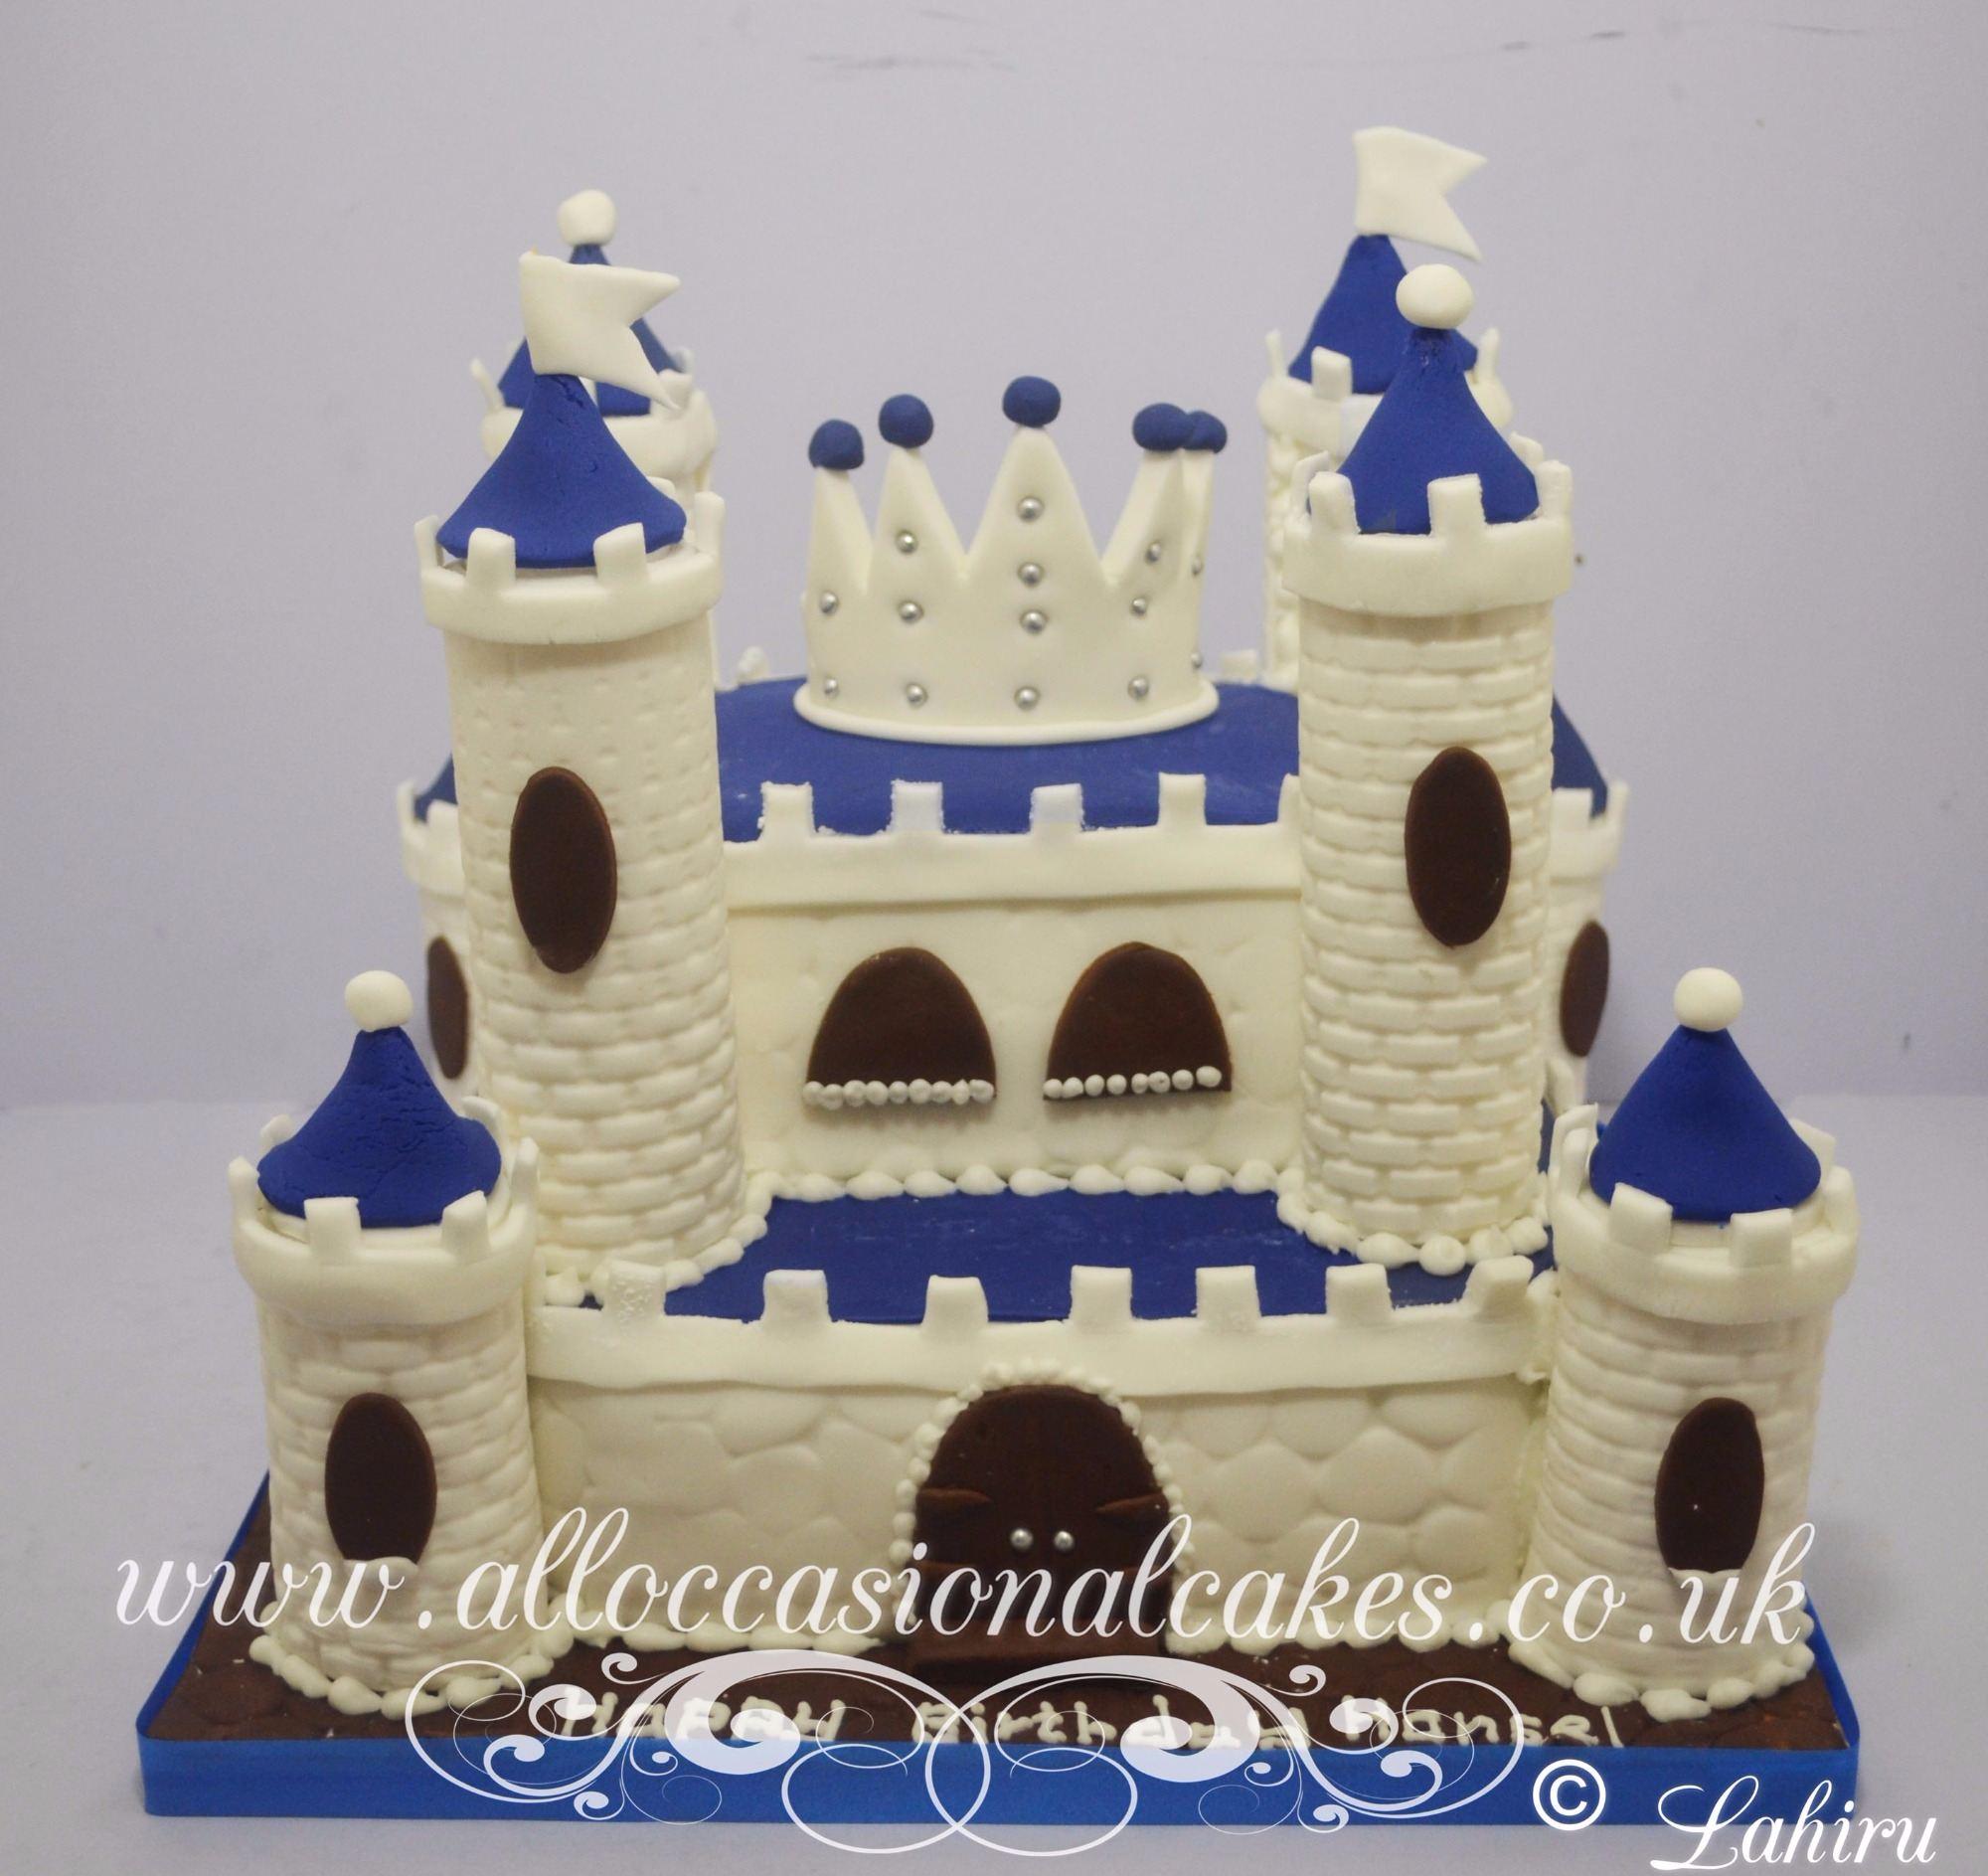 castel cake for him